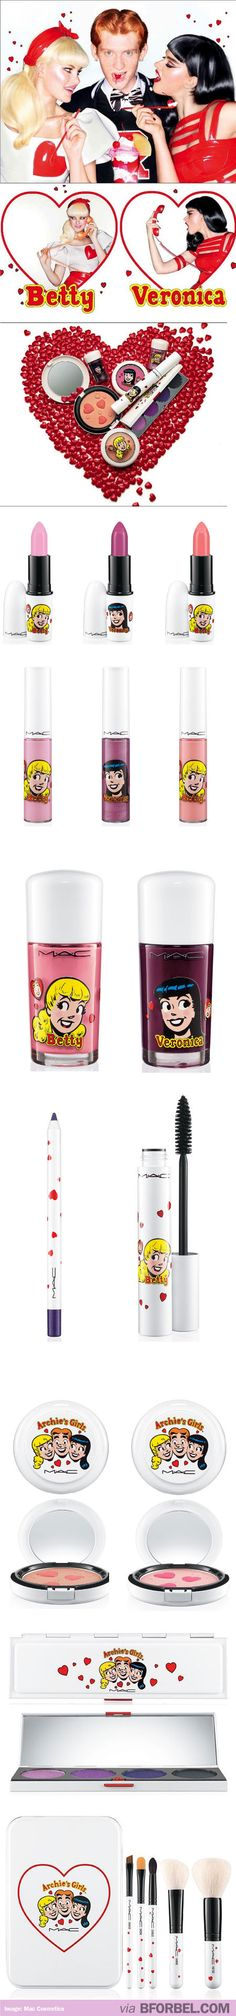 Archie Comics MAC Make up - I NEED THIS